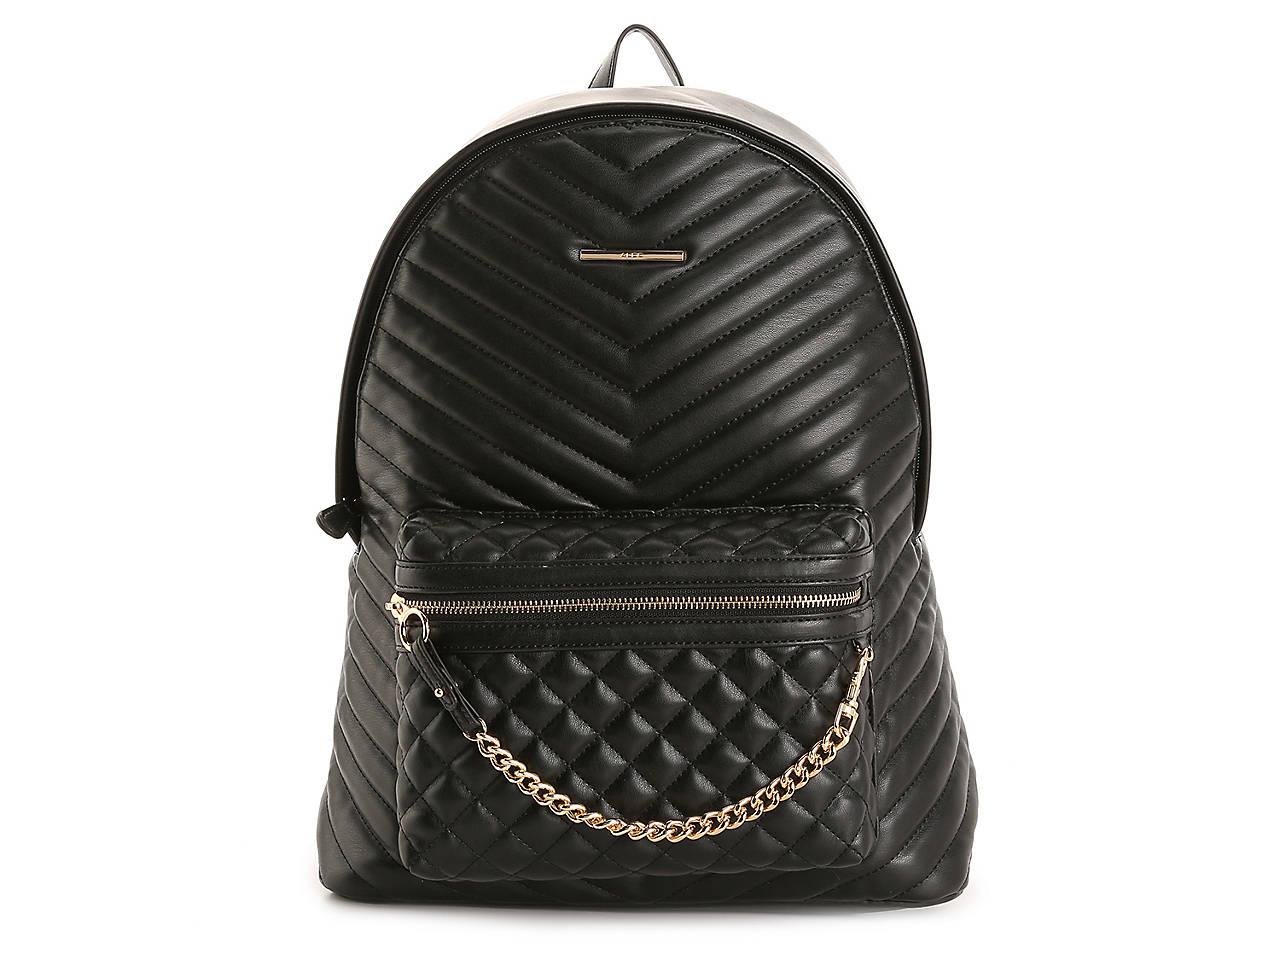 c09b55121dd Aldo Acareria Backpack Women s Handbags   Accessories